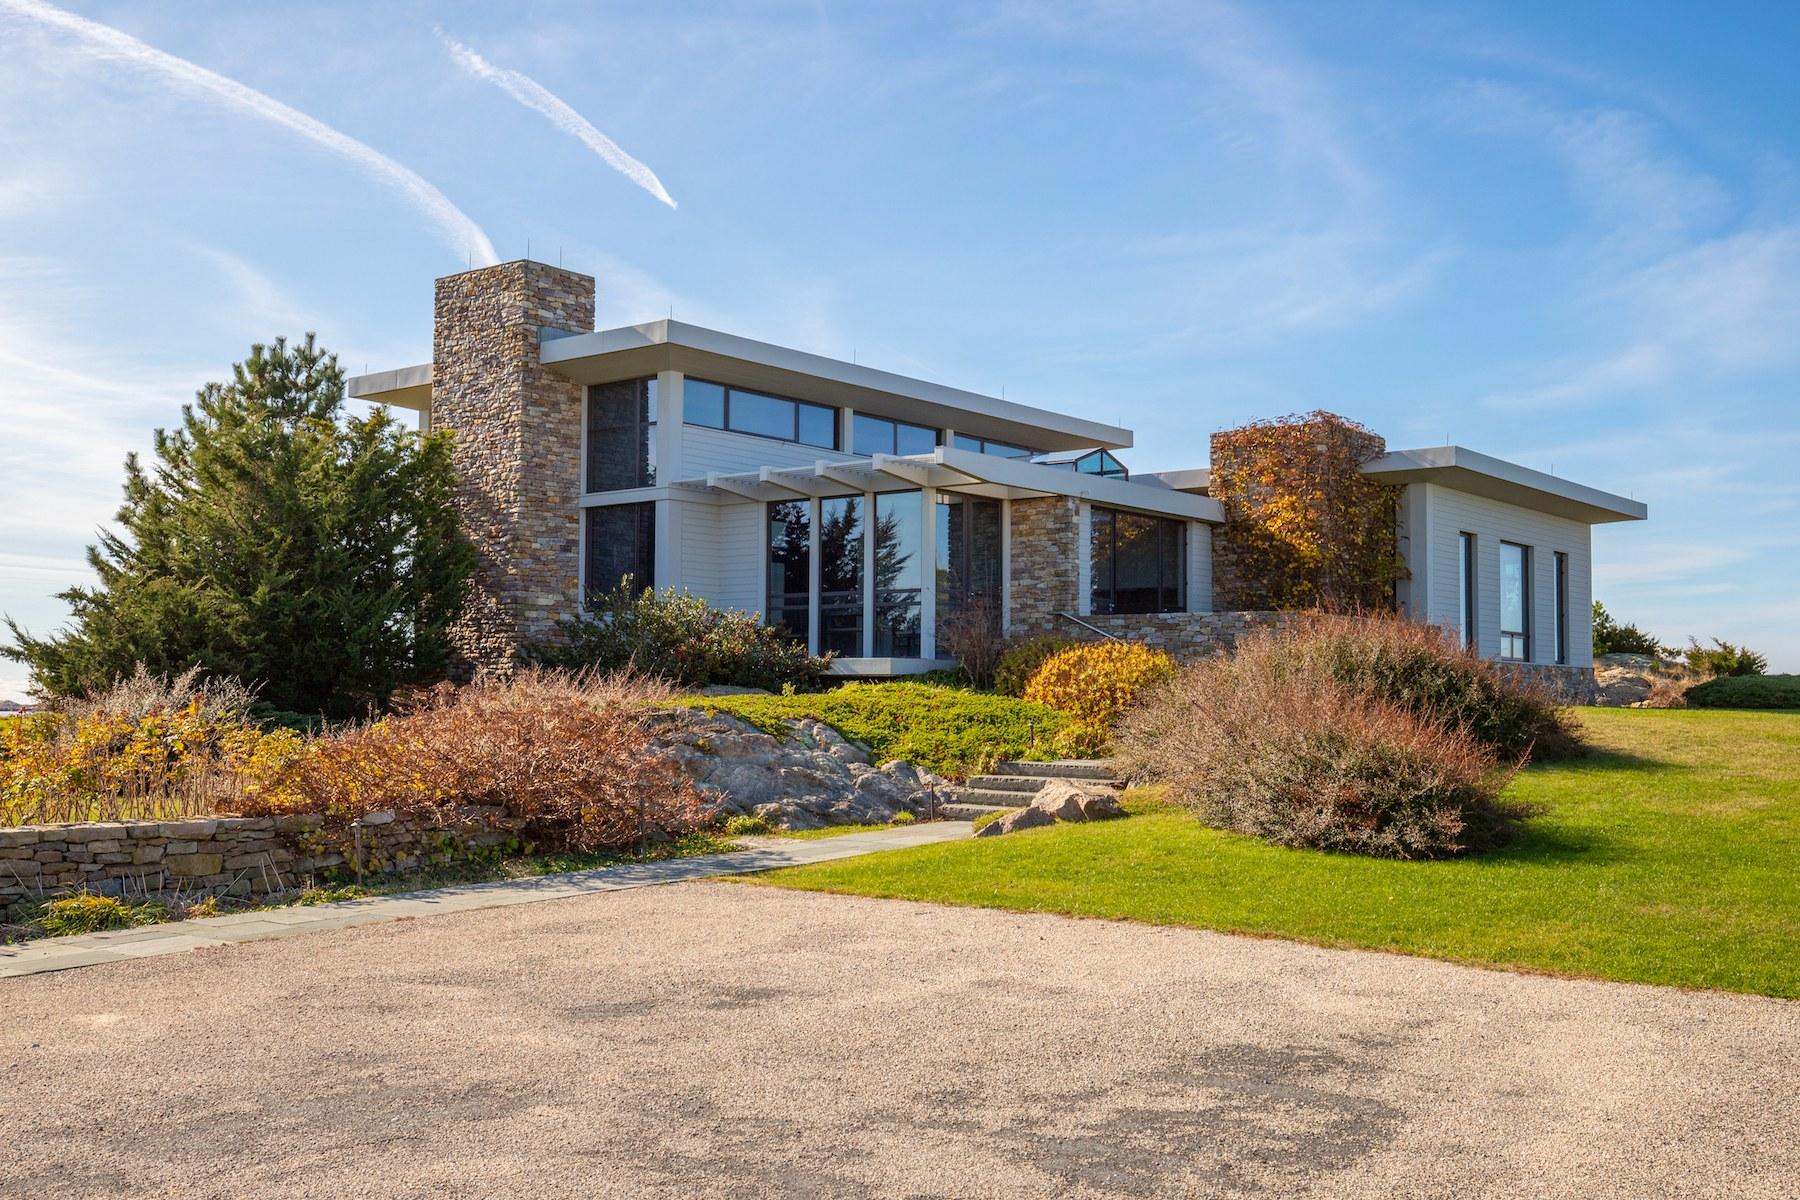 Additional photo for property listing at 1 Ohio Road, Little Compton, RI 1 Ohio Road Little Compton, Rhode Island 02837 United States